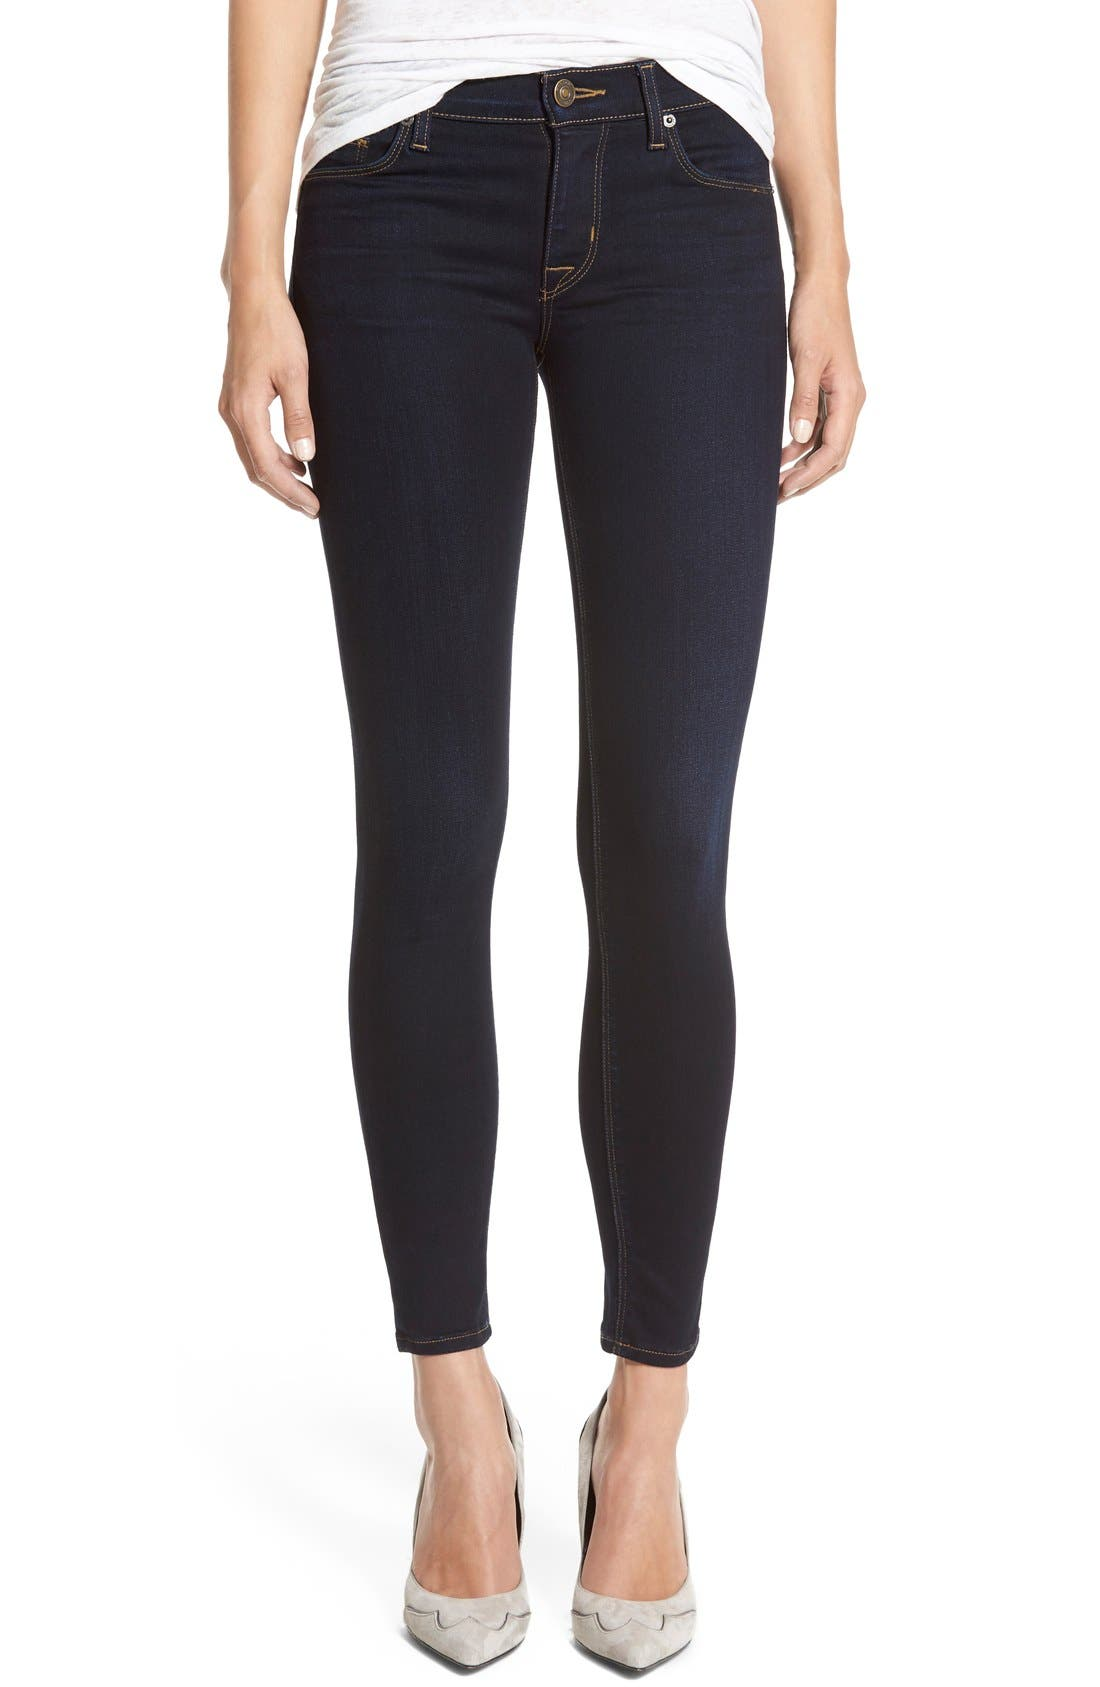 Alternate Image 1 Selected - Hudson 'Krista' Super Skinny Jeans